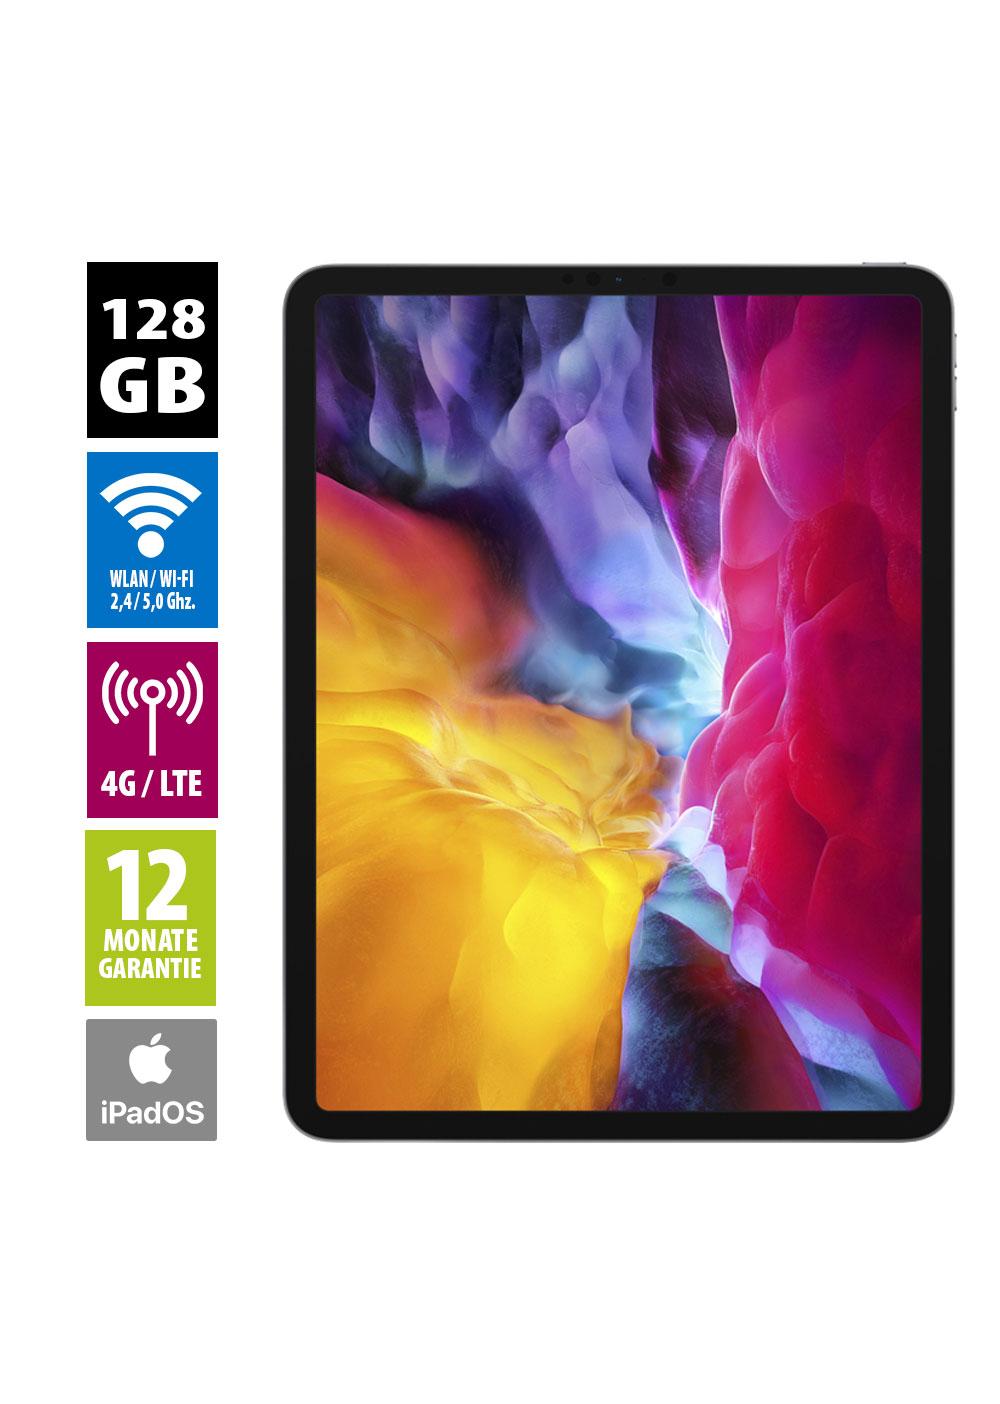 Apple iPad Pro 11 2020 Wi-Fi + Cellular 128GB, Neuwertig, Grade A+